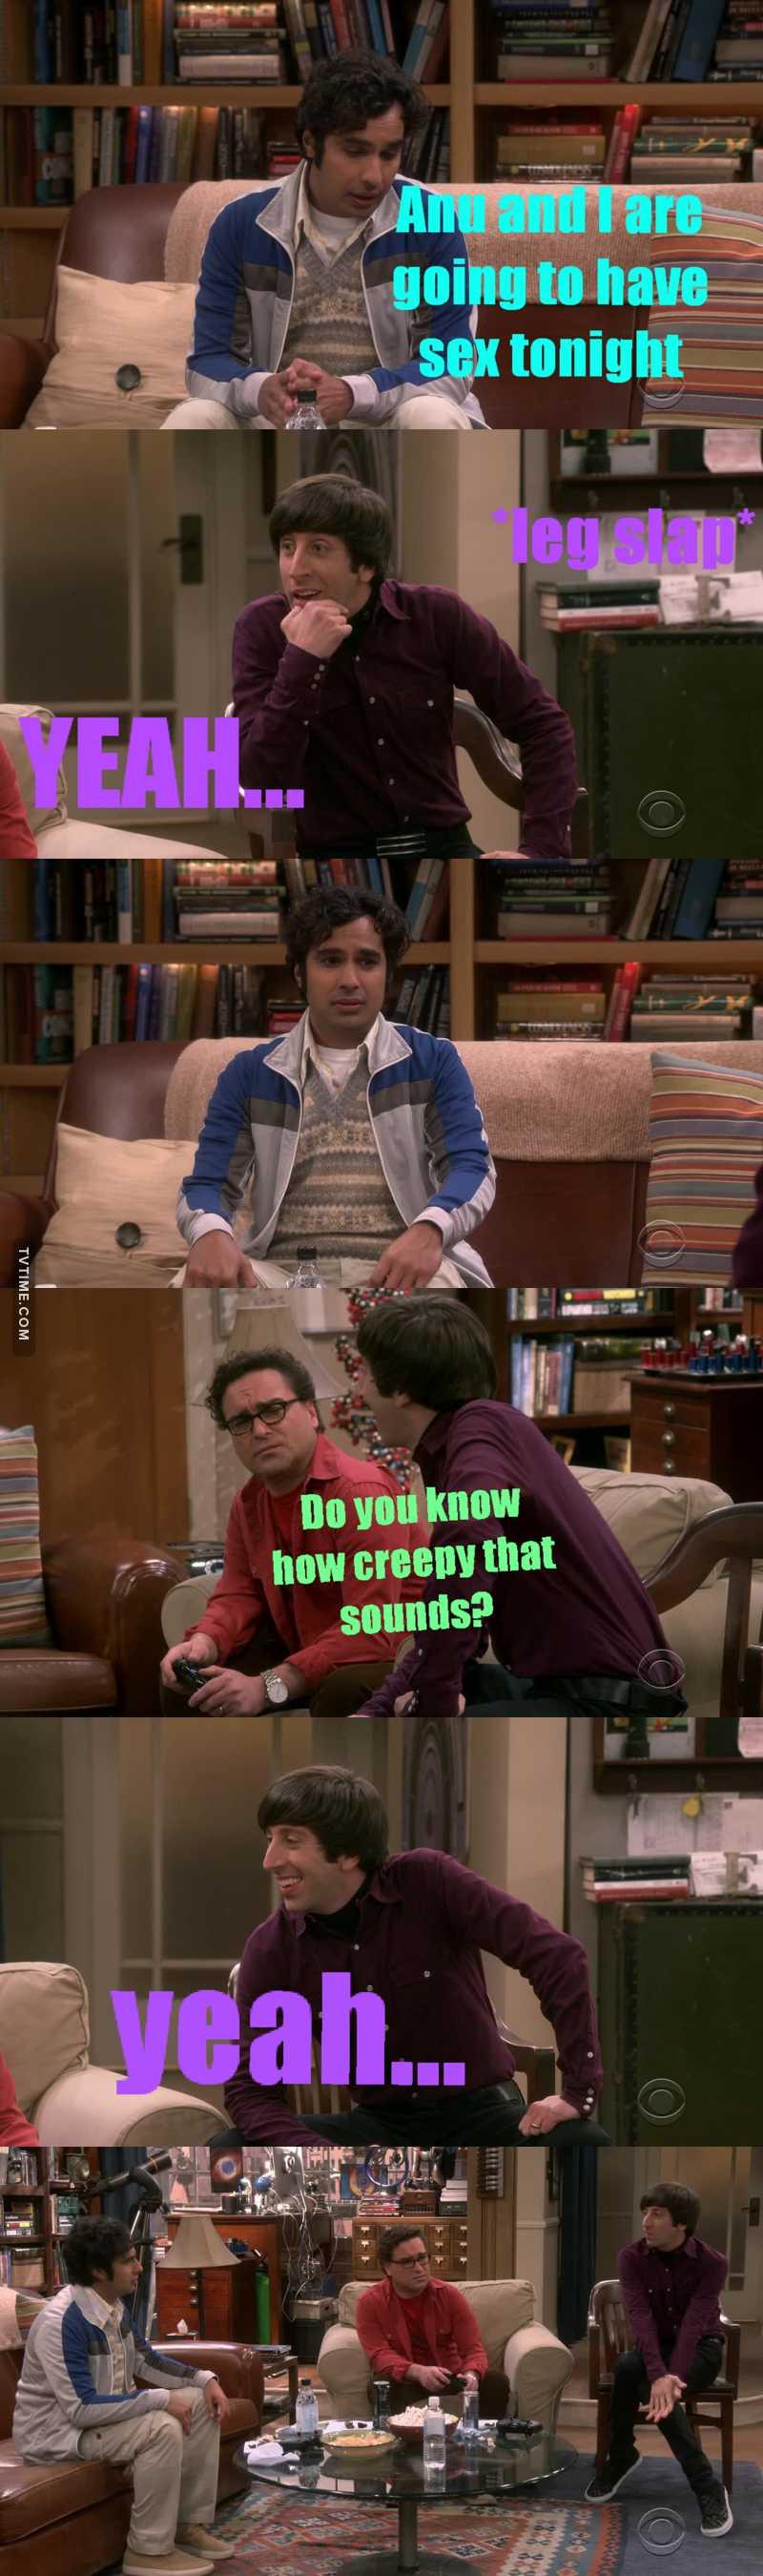 Howard hasn't been this creepy since he got with Bernadette  😂😂😂